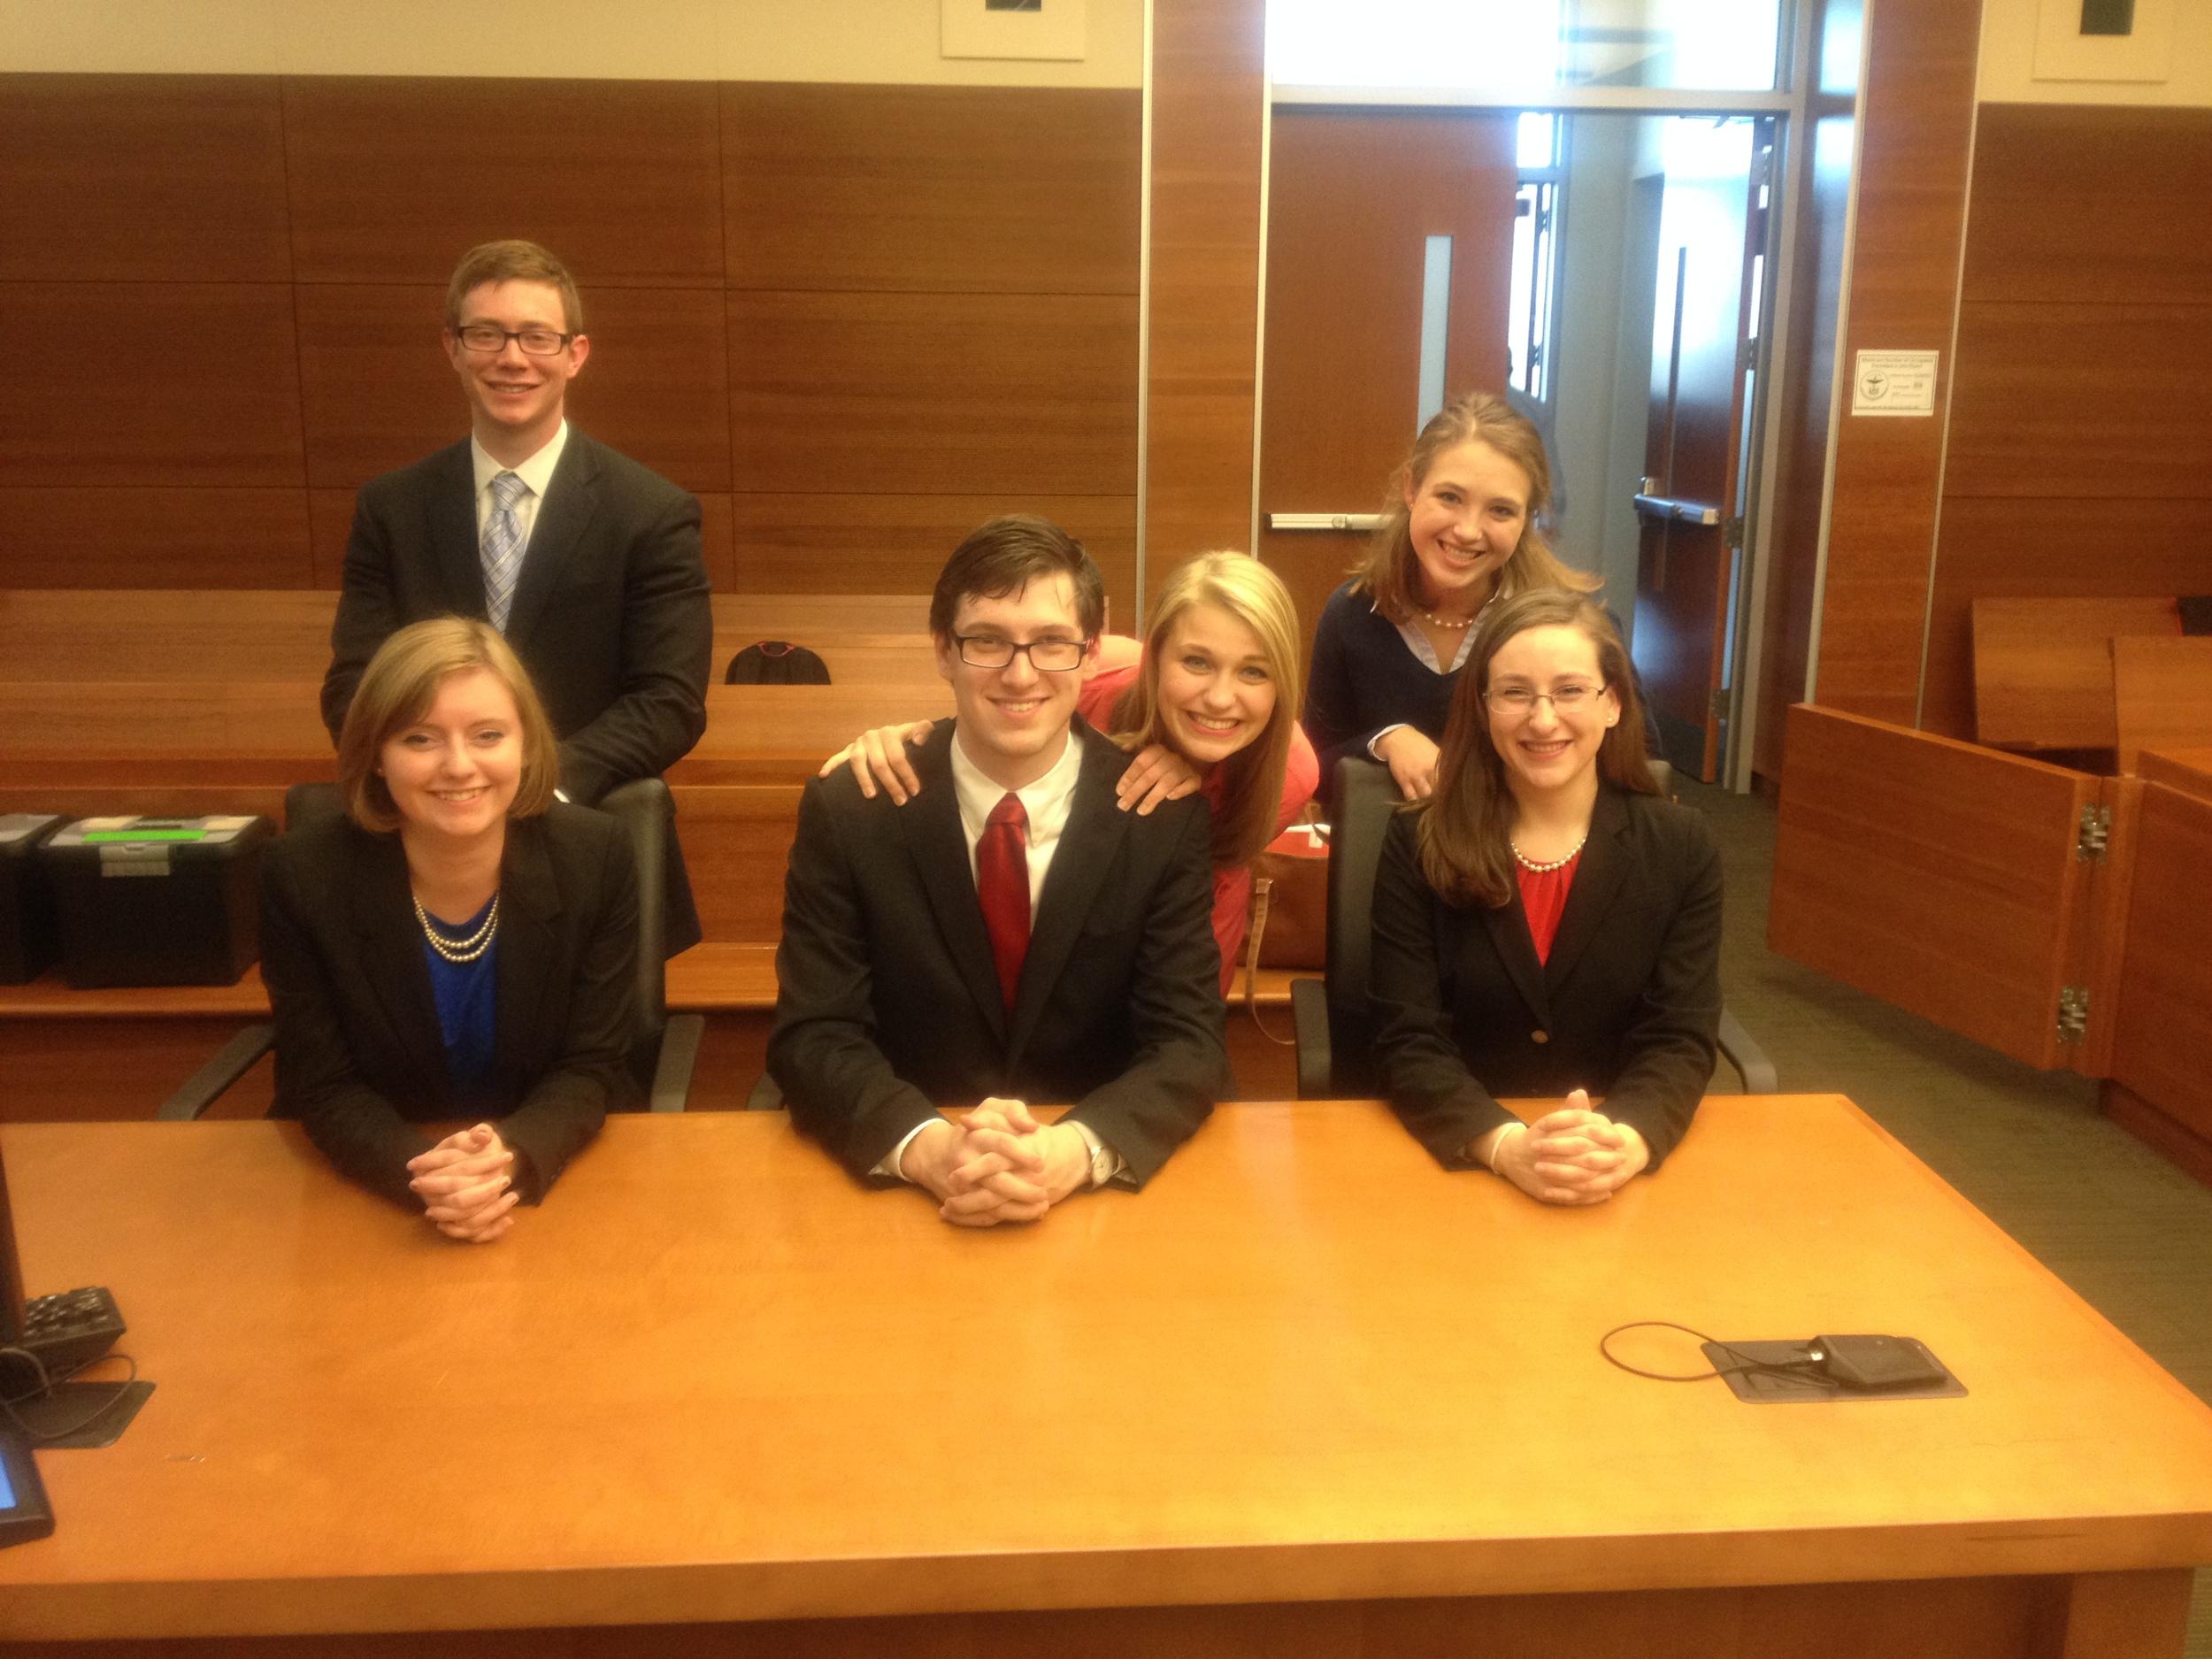 Miami C: Park Family Counsel